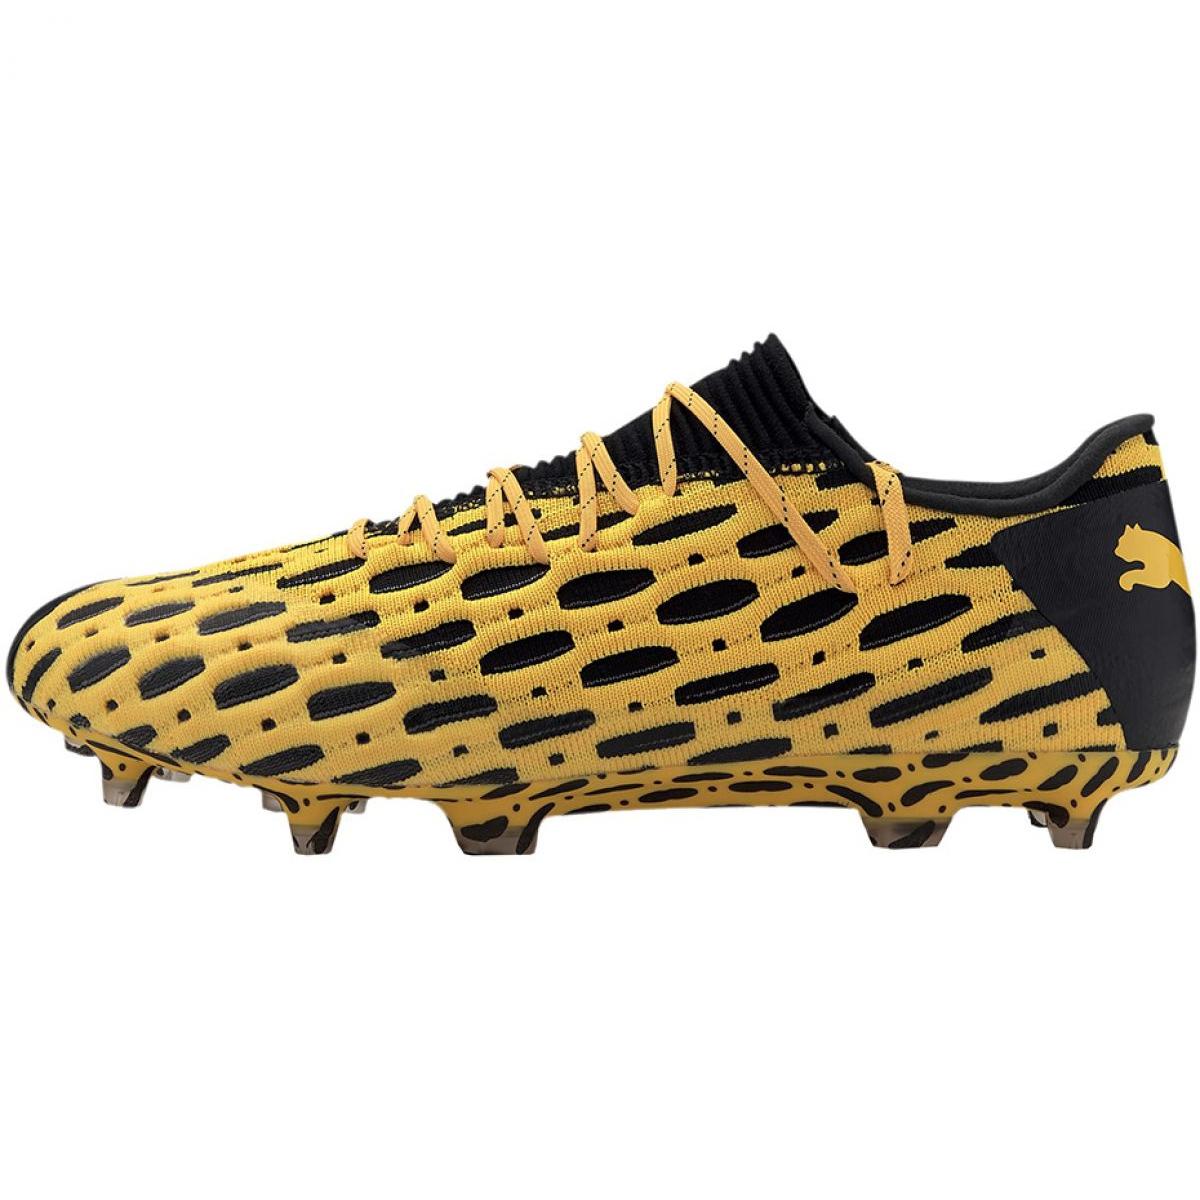 Puma Future 5.1 Netfit Low Fg Ag M 105791 02 football shoes yellow yellow